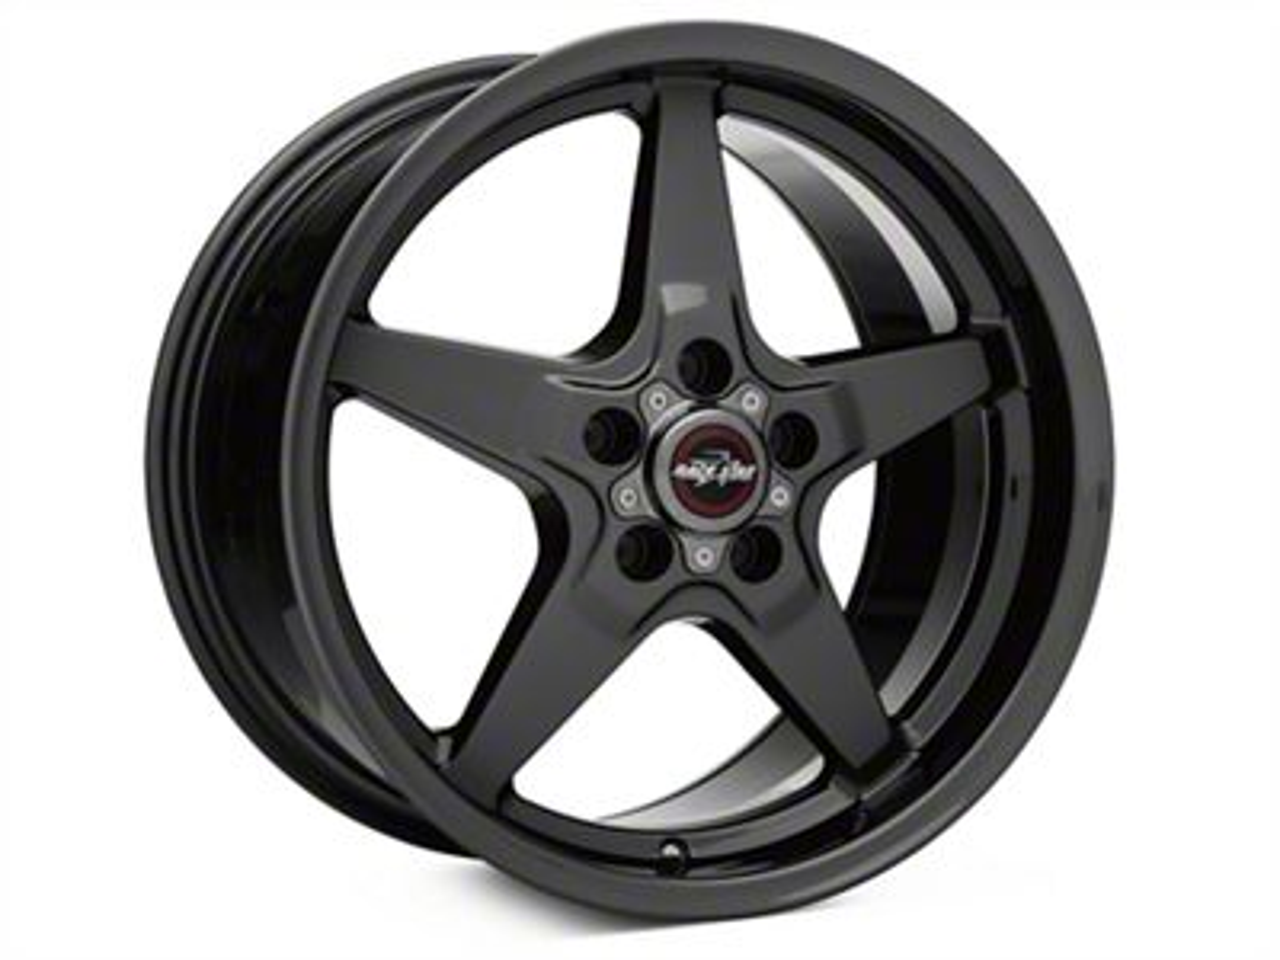 Race Star Dark Star Drag Wheel - 18x10.5 - Rear Only (05-14 All)